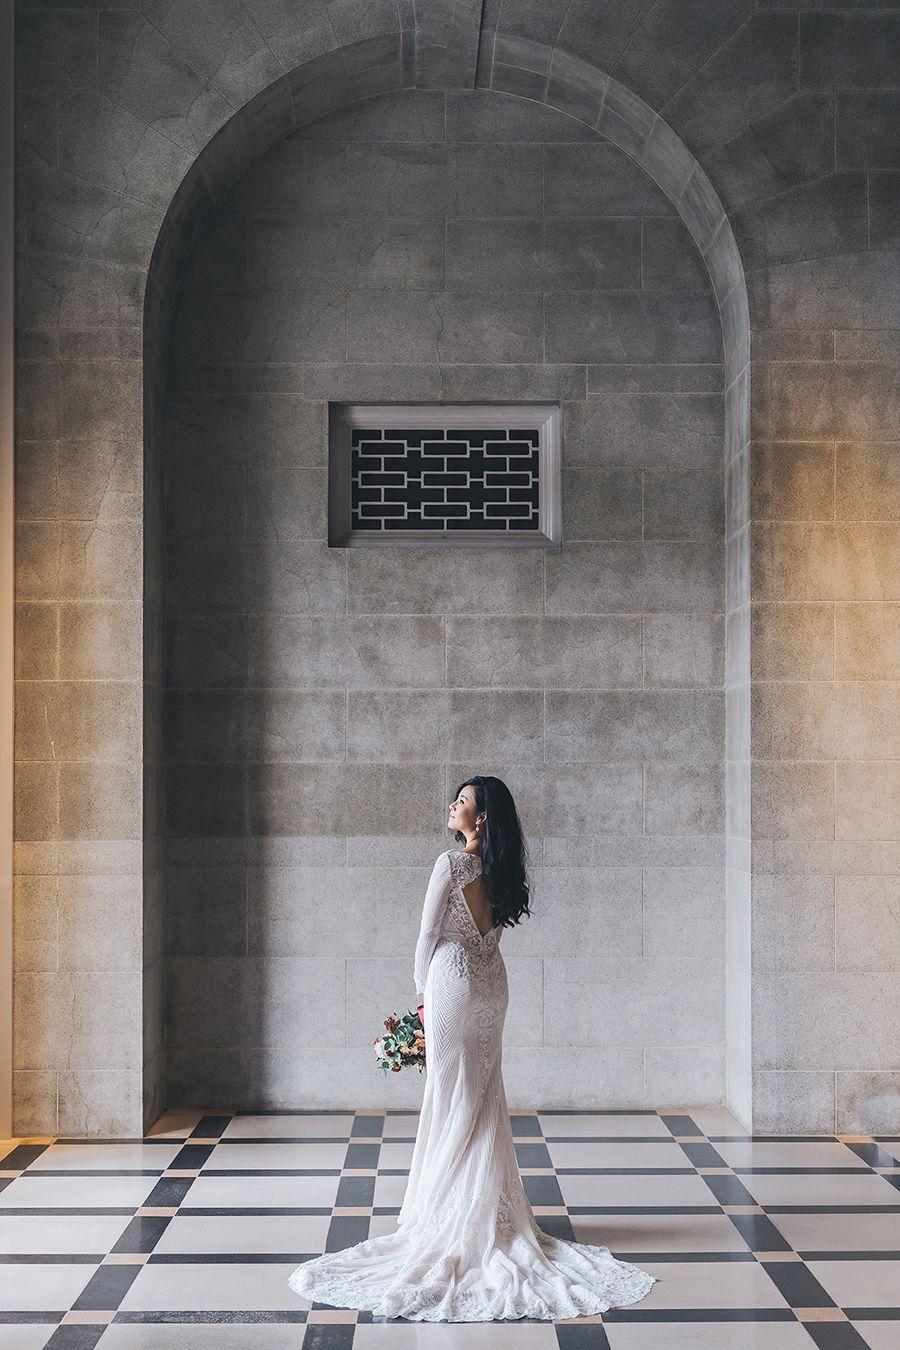 Top 50 Pre Wedding Poses Pre Wedding Photography Ideas 2020 Cute766